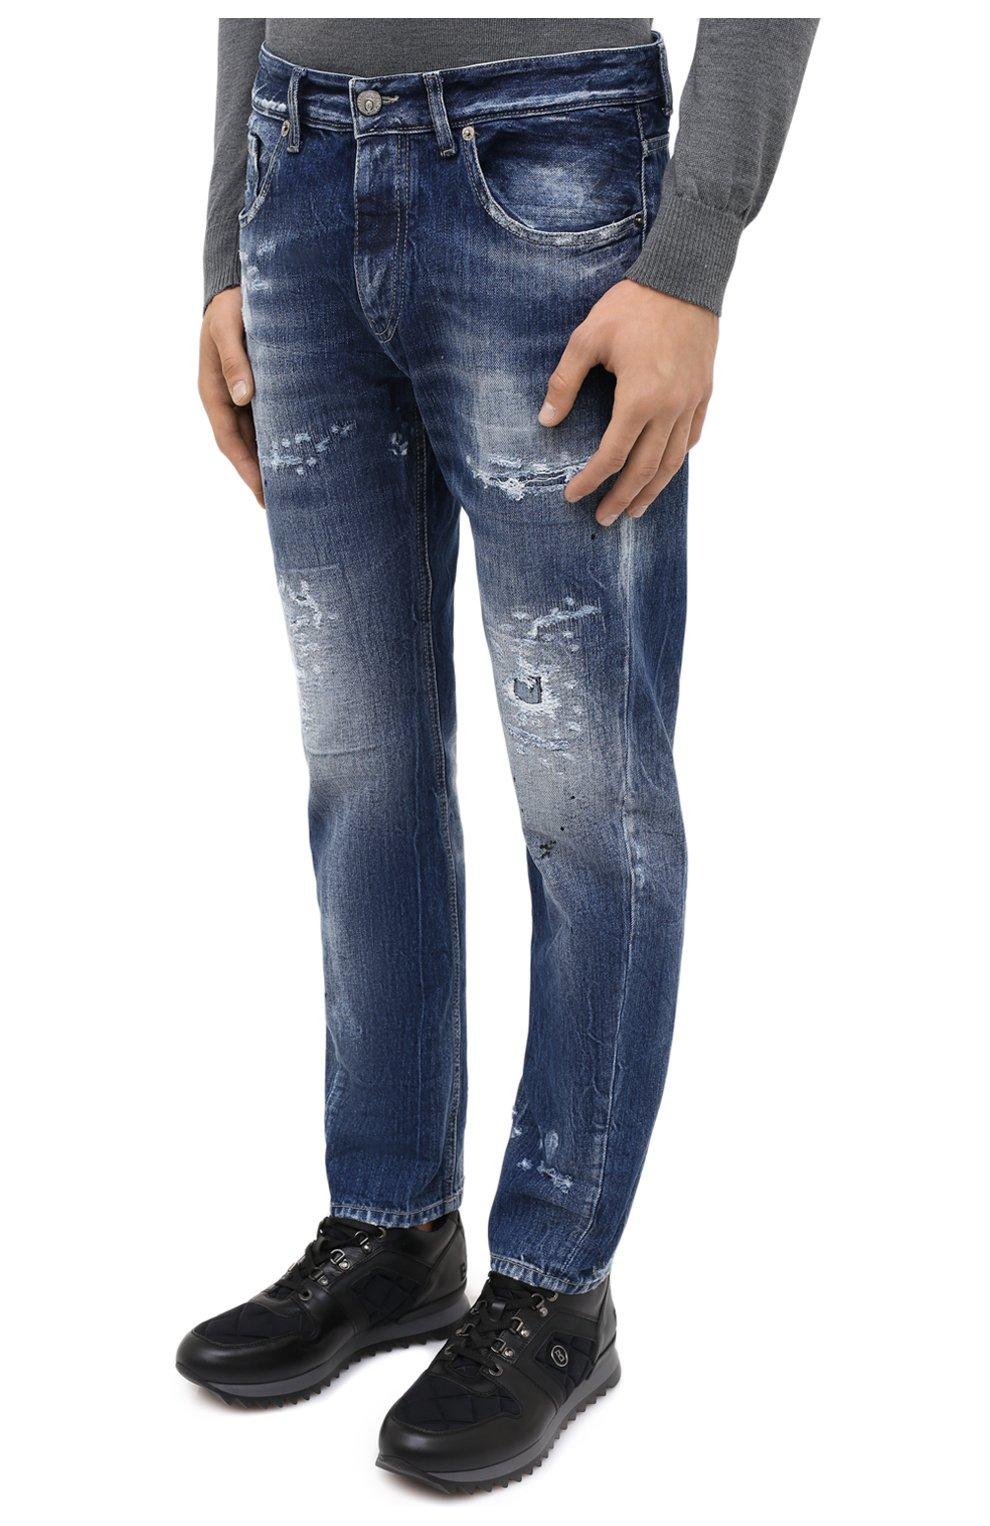 Мужские джинсы PREMIUM MOOD DENIM SUPERIOR синего цвета, арт. F21 352740221/BARRET   Фото 3